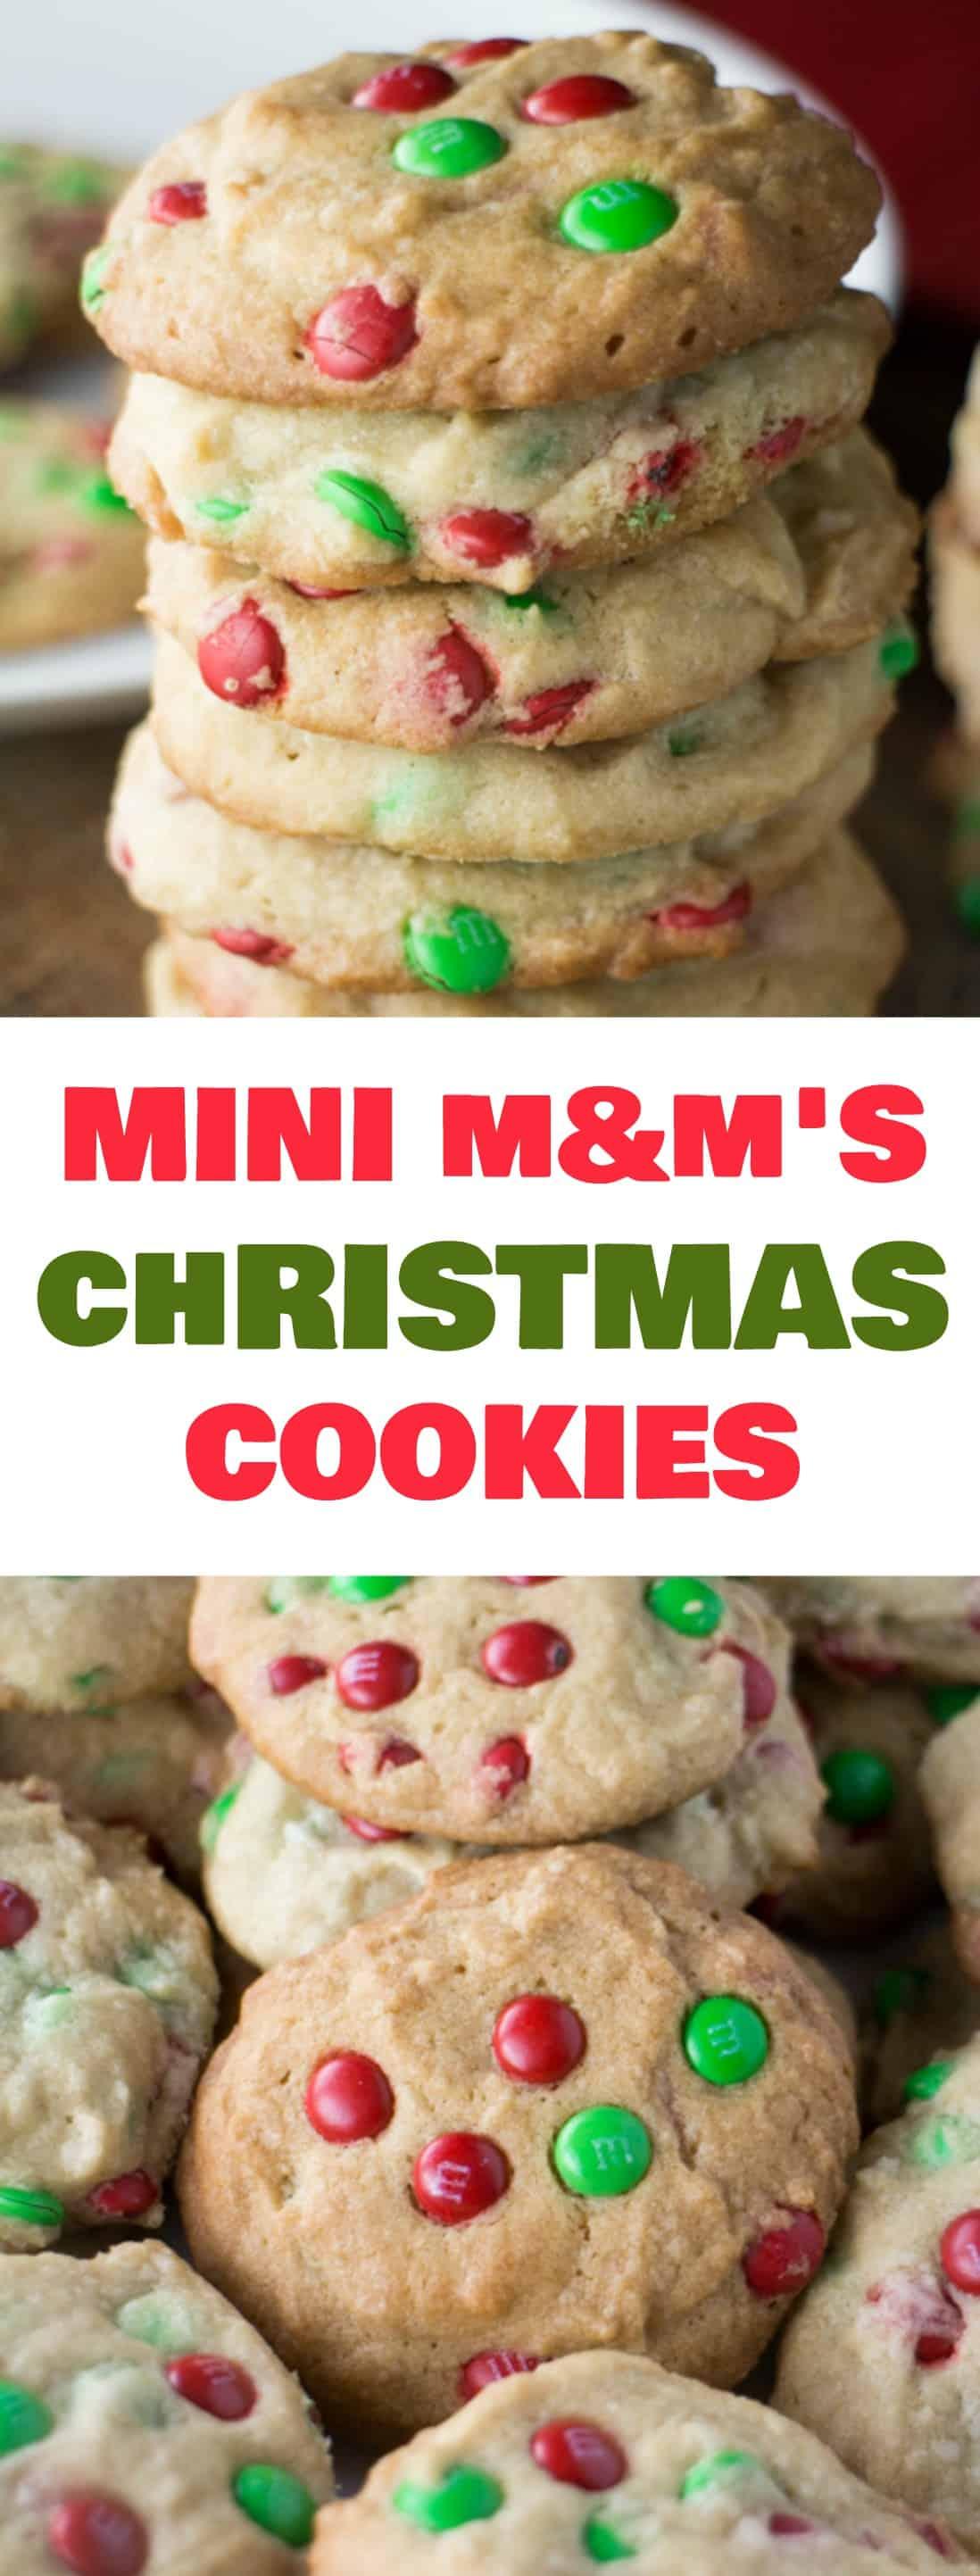 mini-mms-holiday-christmas-cookies - Brooklyn Farm Girl